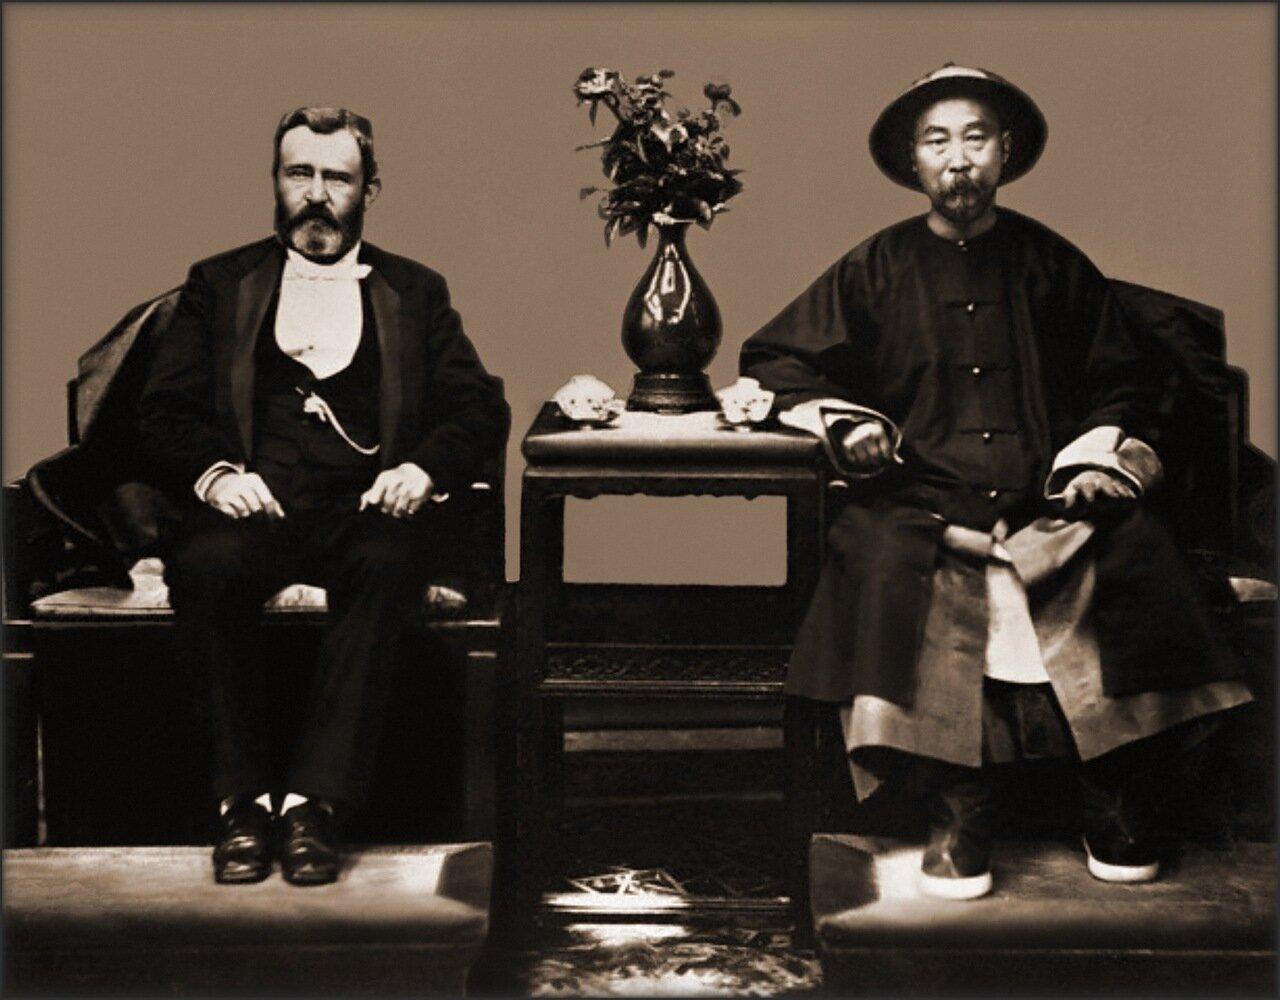 1879. Генерал Улисс Грант и Ли Хунчжан, наместник Чжили. Тяньцзин